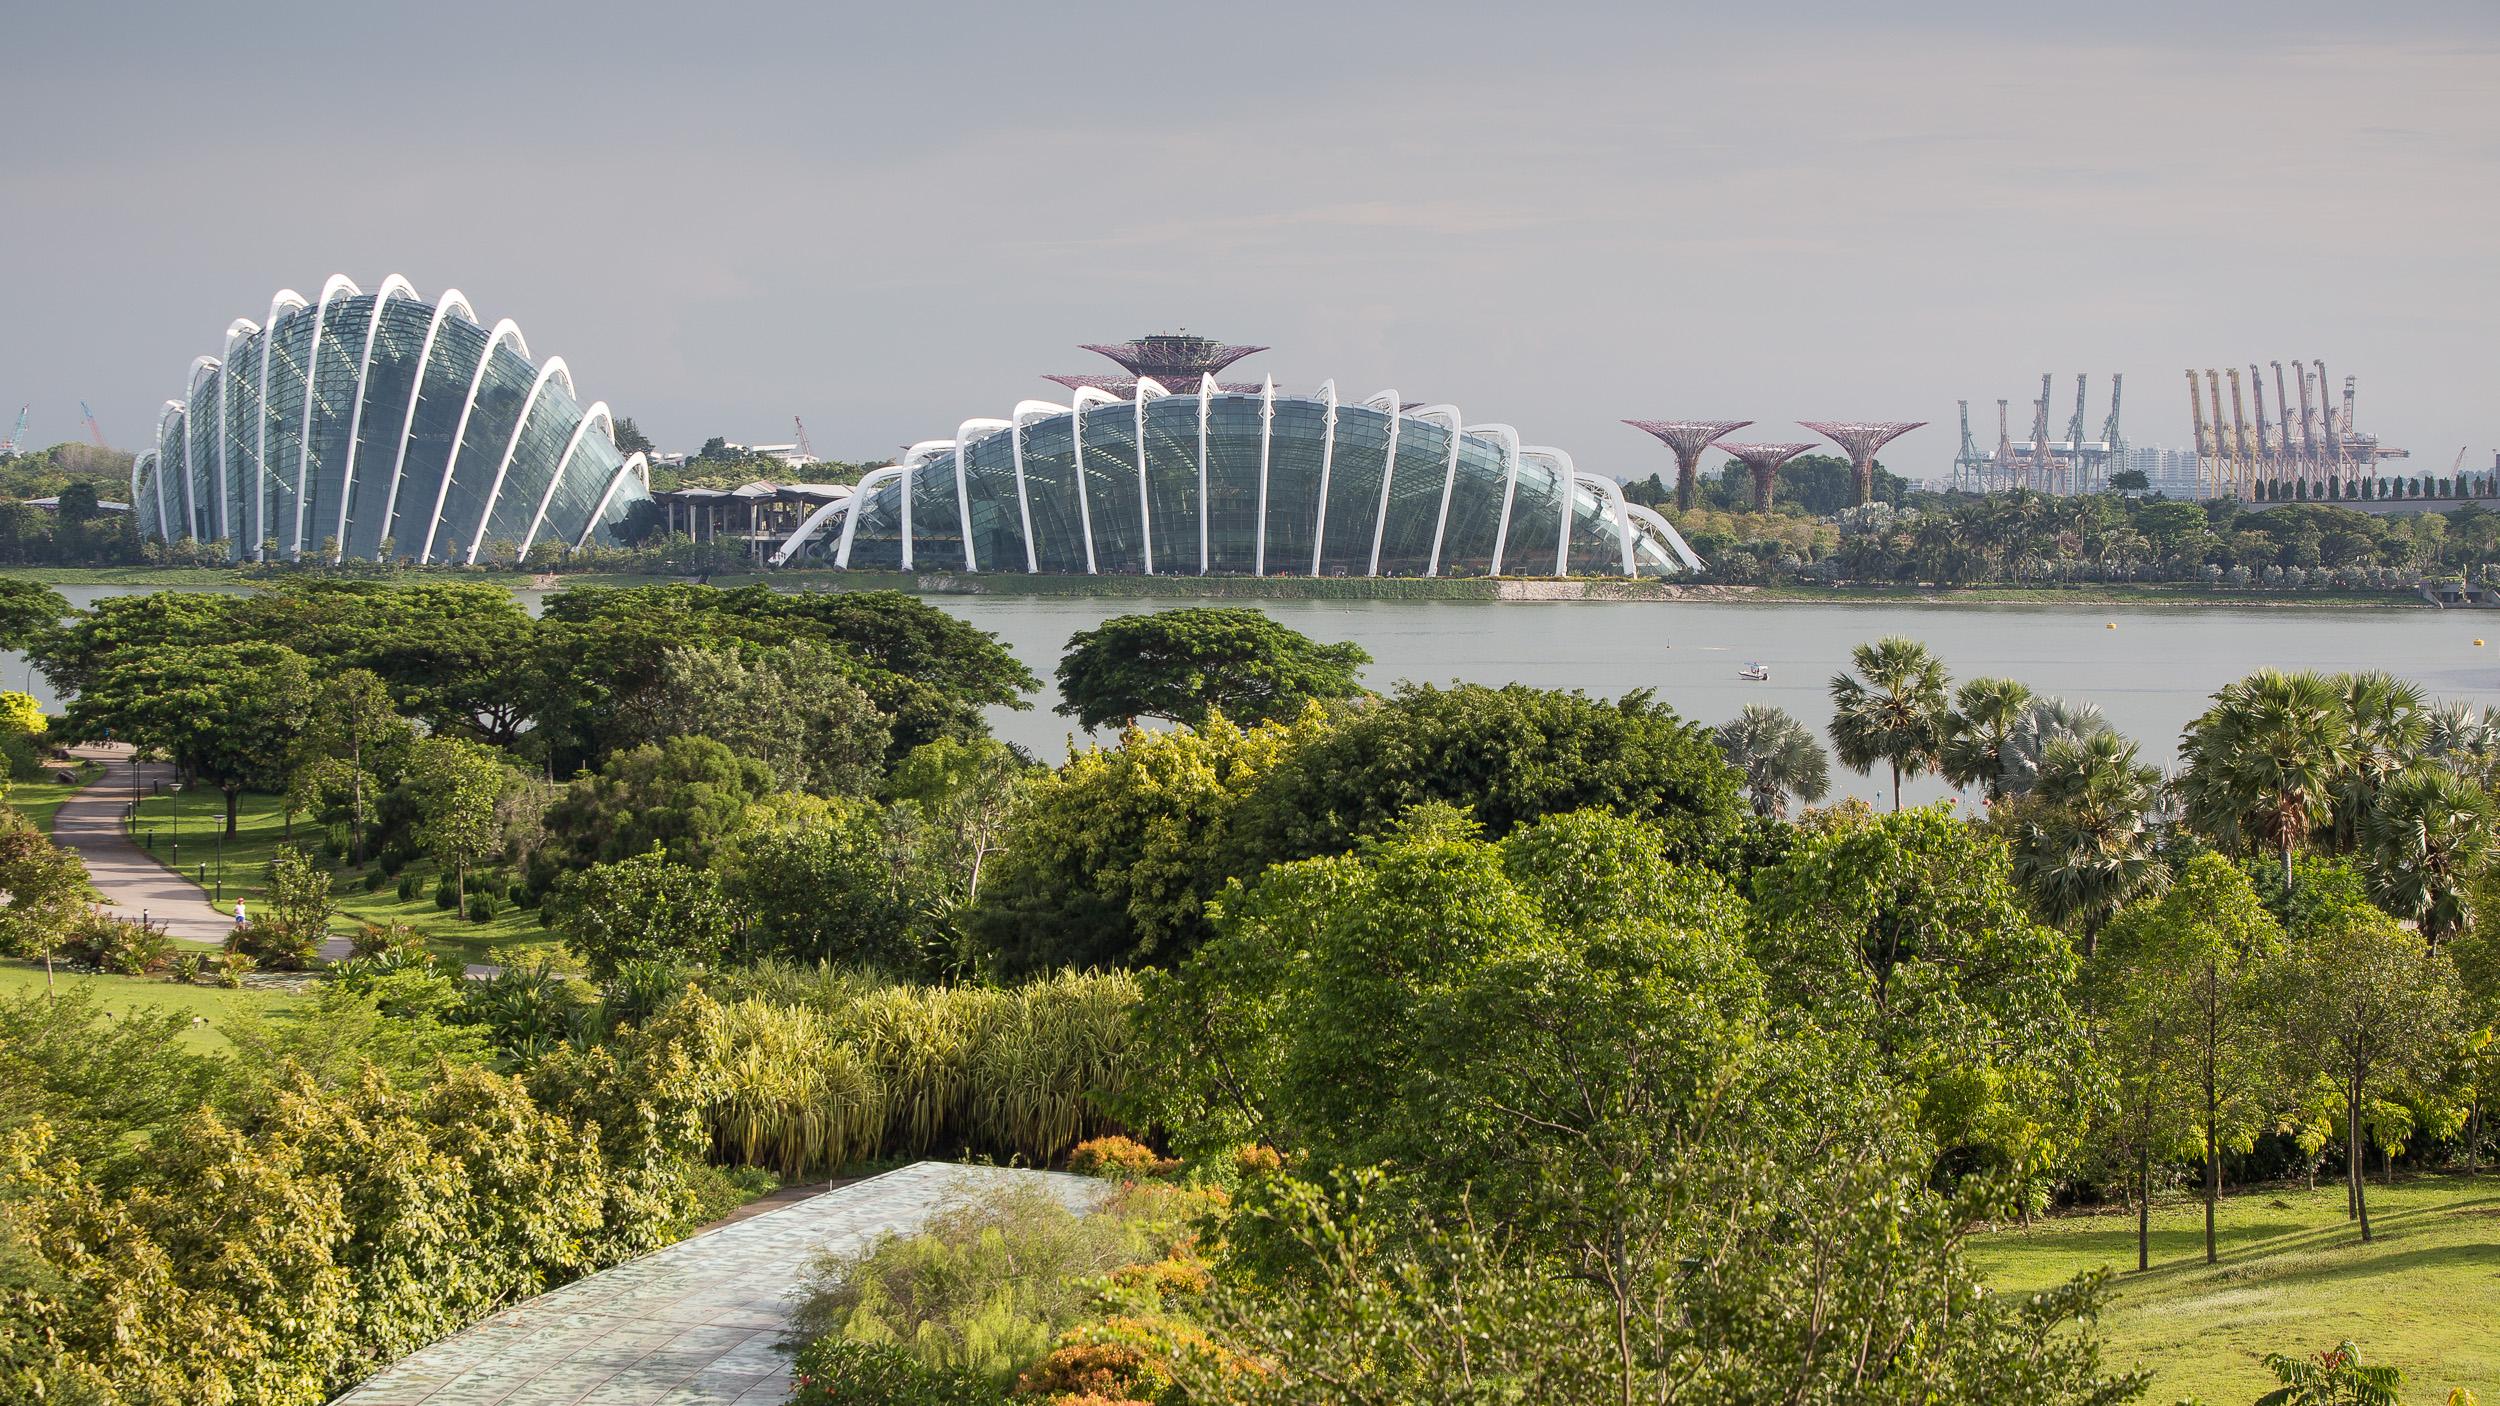 singapore-editorial-commercial-photographer-zainal-zainal-studio-03.jpg